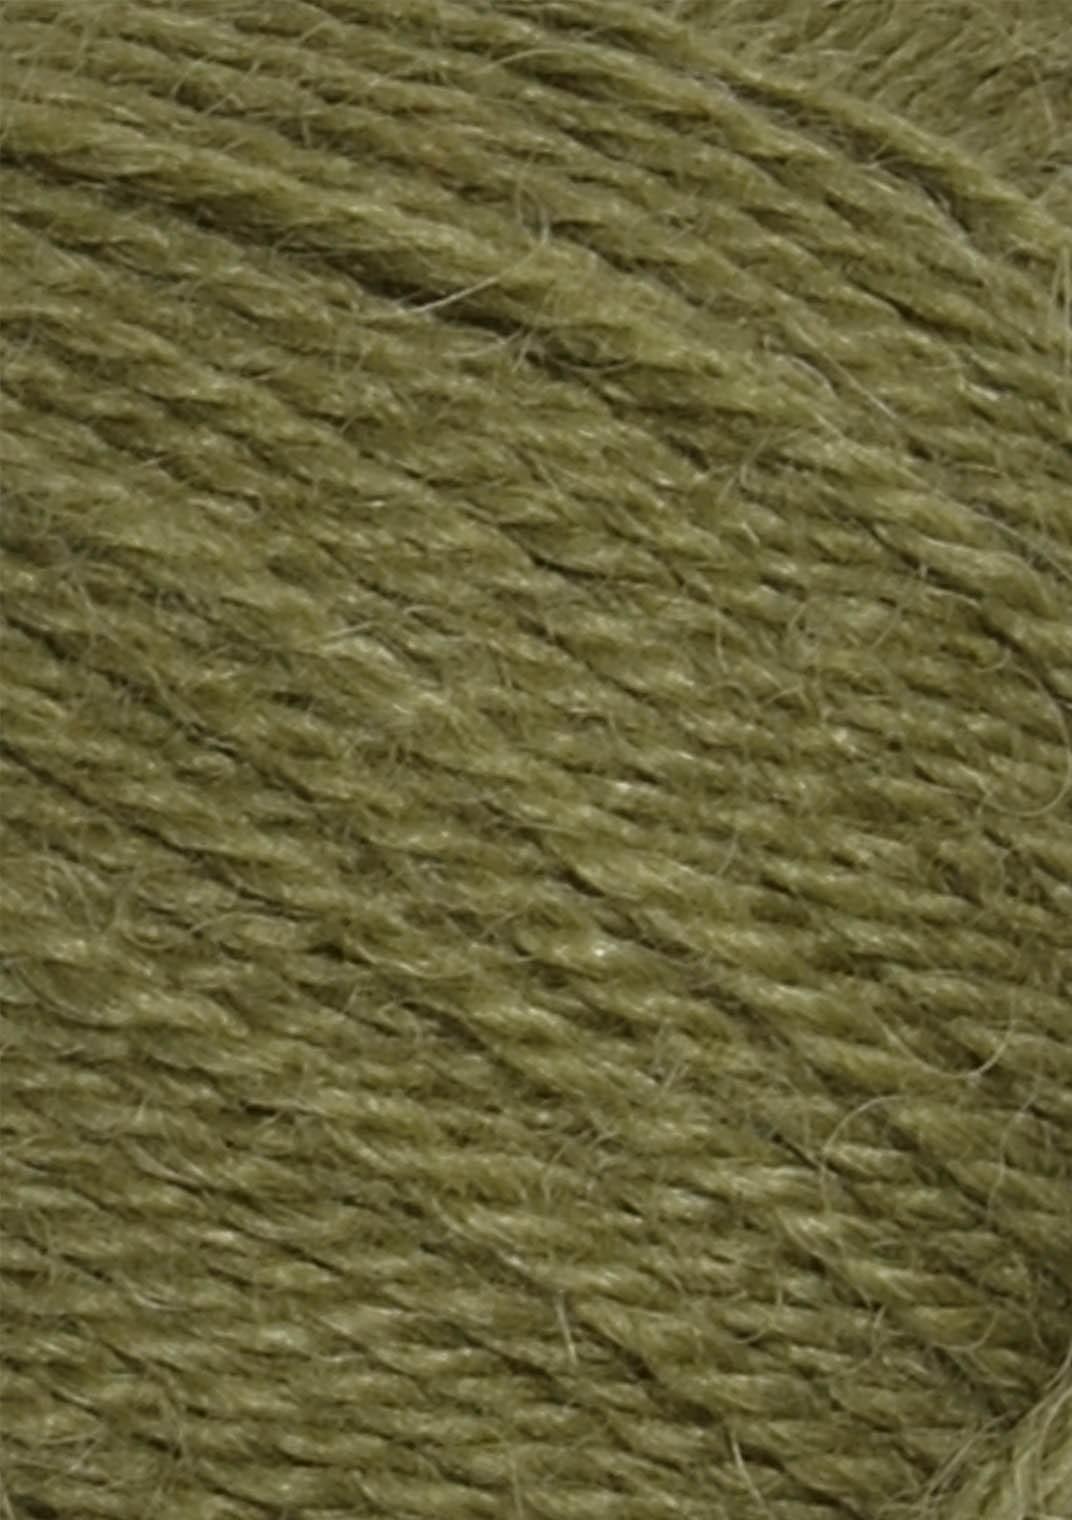 9554 Oliven Mini Alpakka Sandnes garn